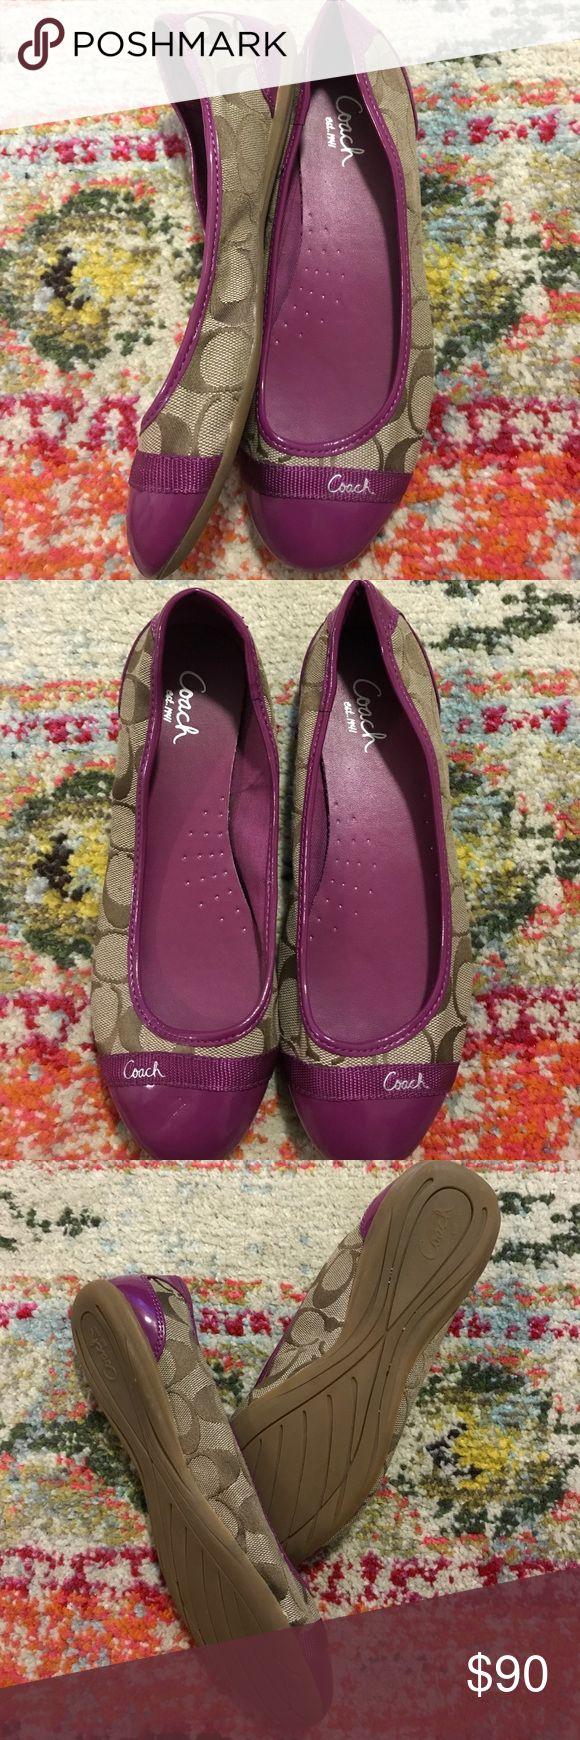 Coach flats Purple and Tan coach flats. Lightly worn. Coach Shoes Flats & Loafers